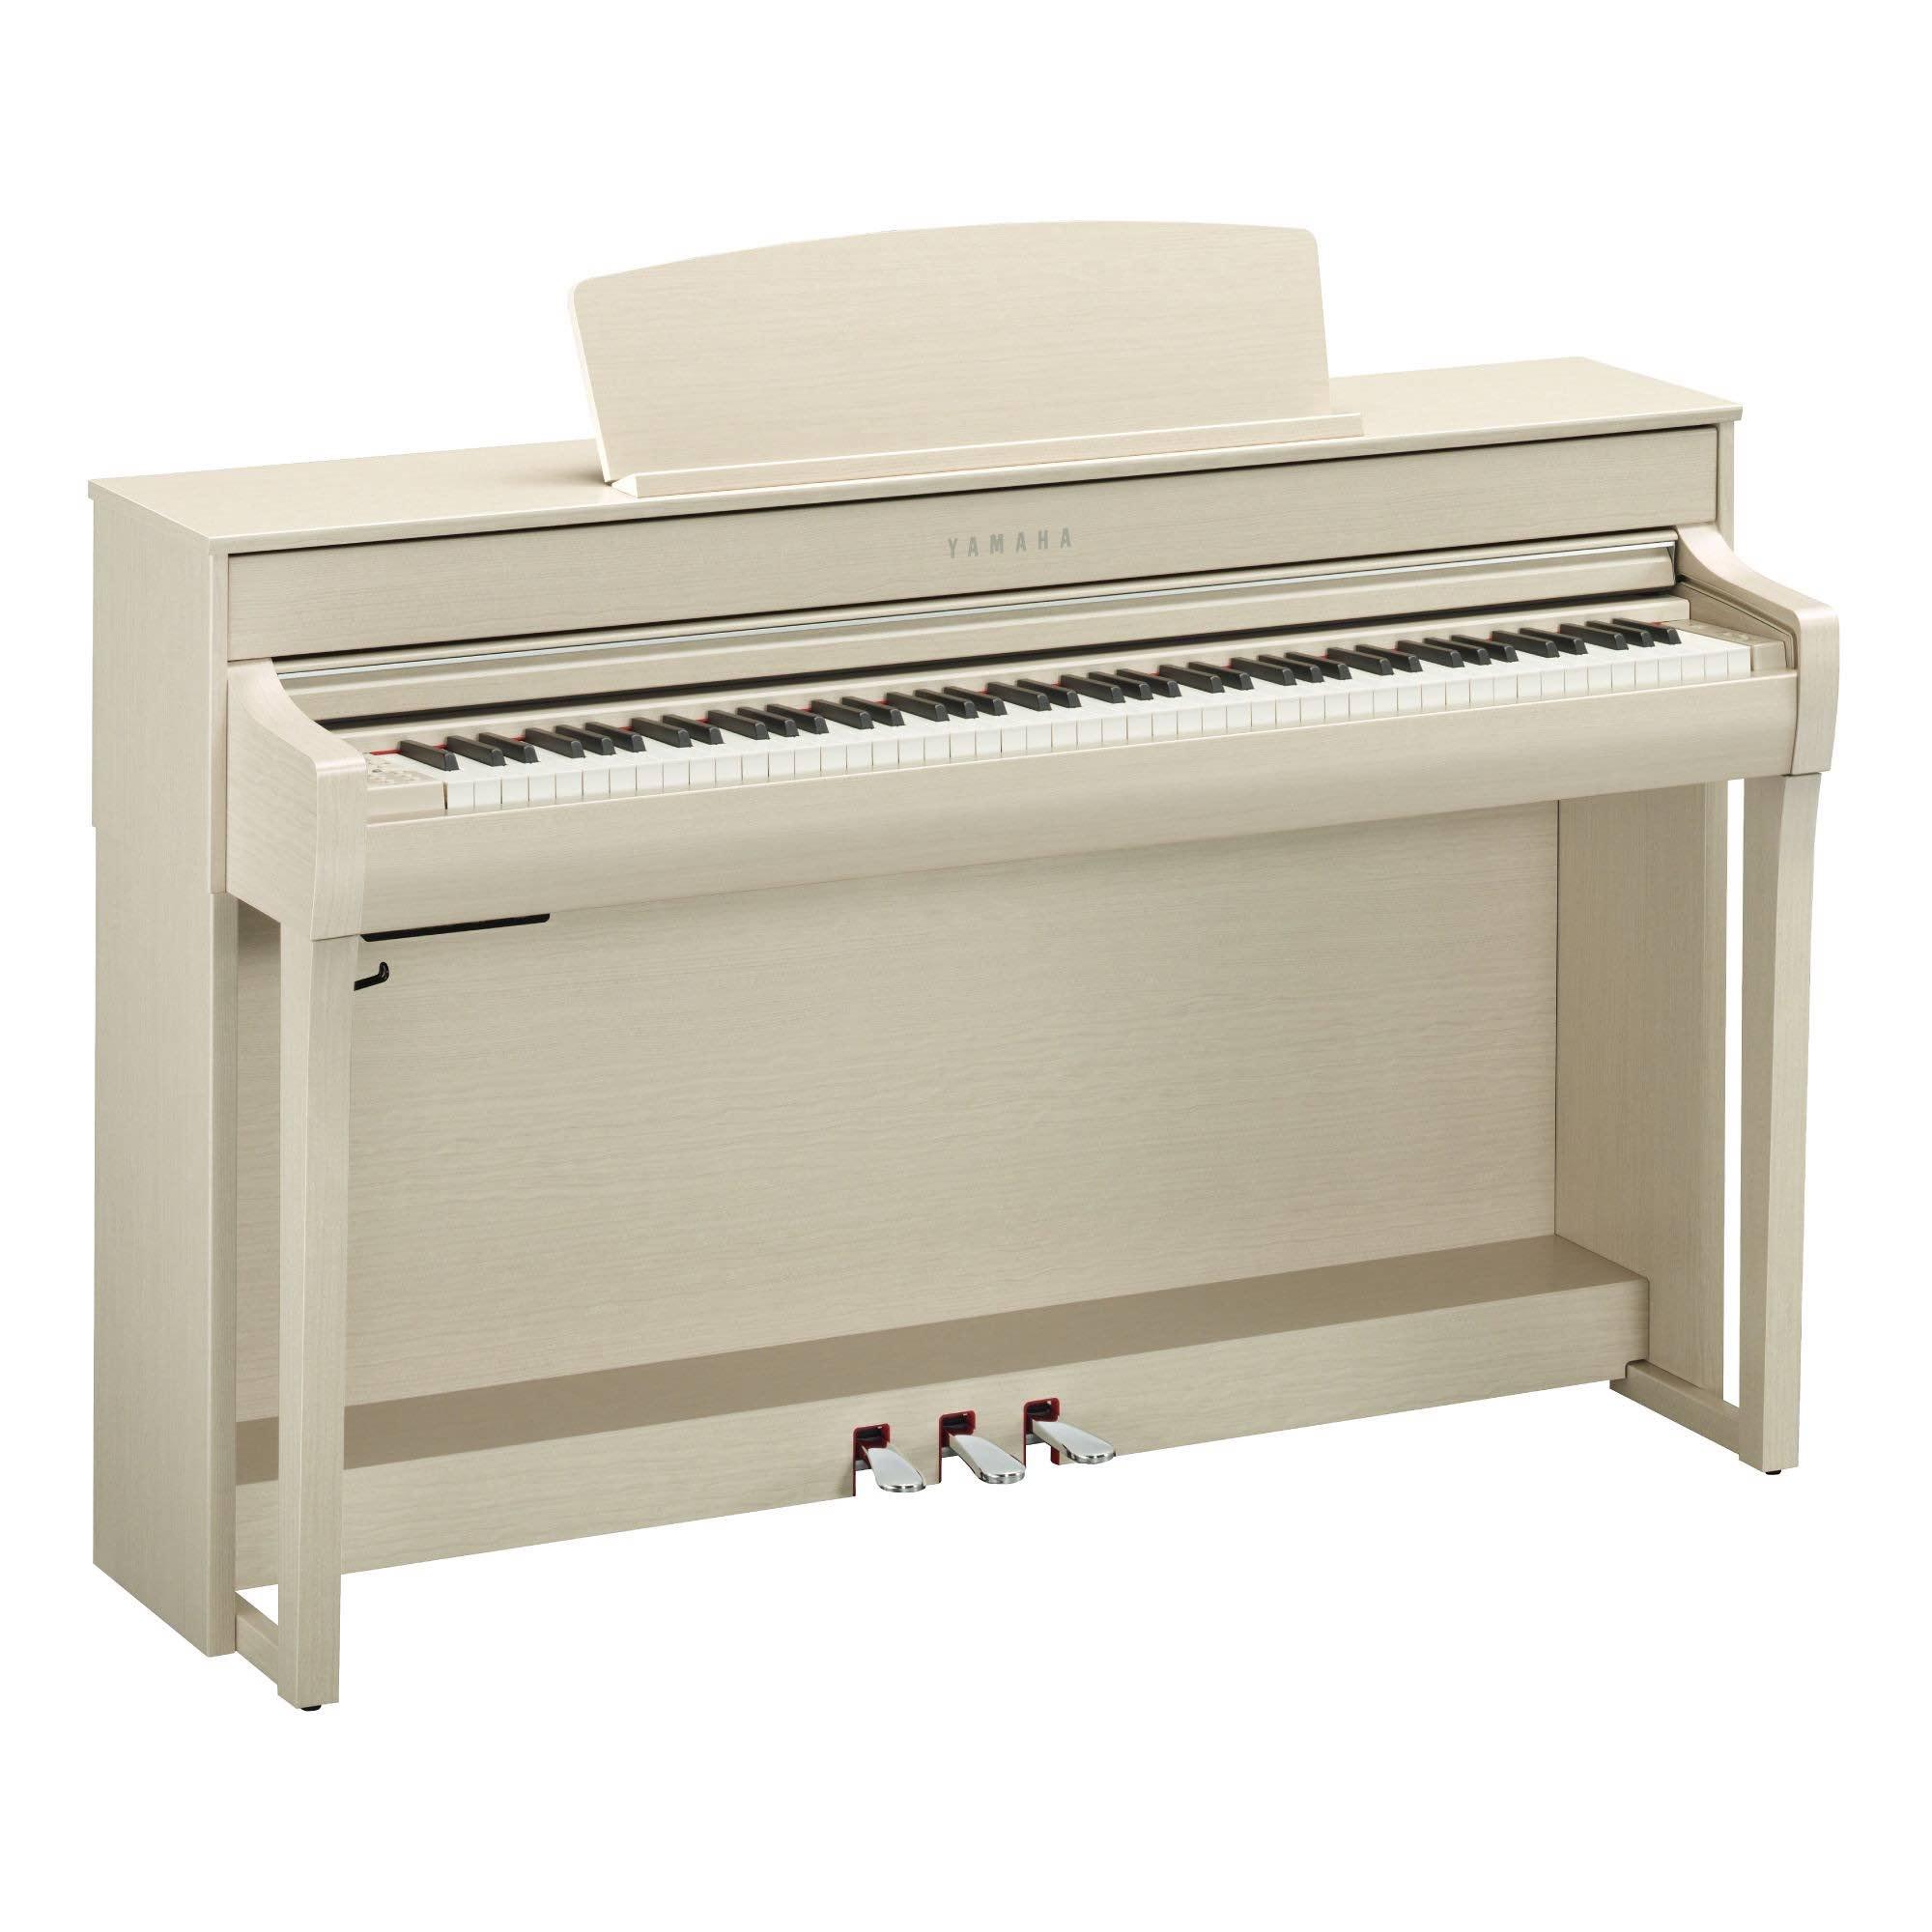 Yamaha clp-745 Clavinova CLP700 stage digitale keyboard home piano mezza coda muro strumenti musicali